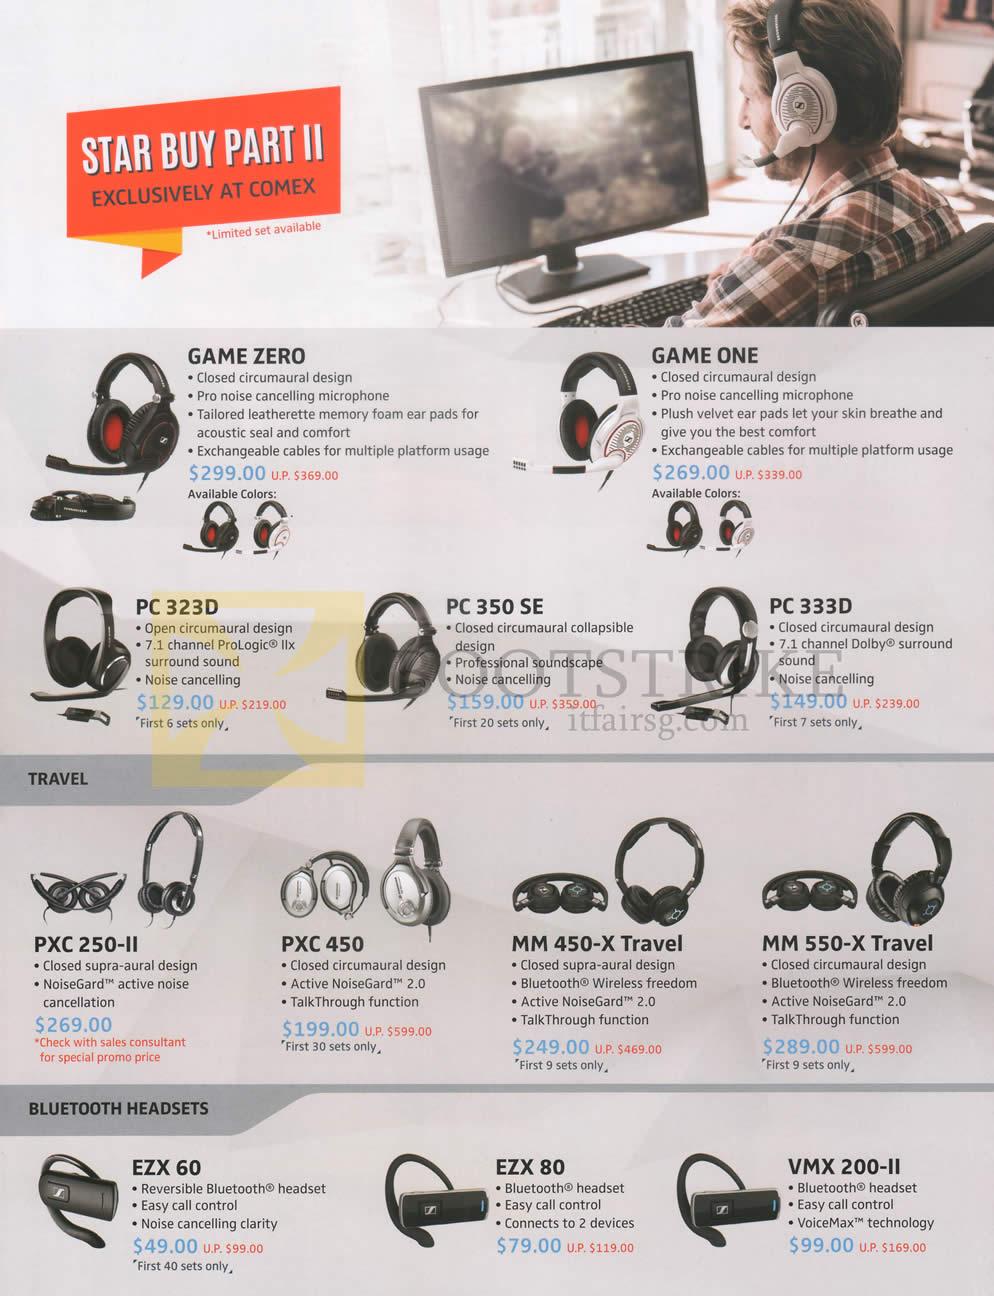 COMEX 2016 price list image brochure of Sennheiser Headphones, Bluetooth Headsets, Game Zero, One, PC 323D, 350 SE, 333D, PXC 250-II, 450, MM 450-X Travel, 550-X Travel, EZX 60, 80, VMX 200-II